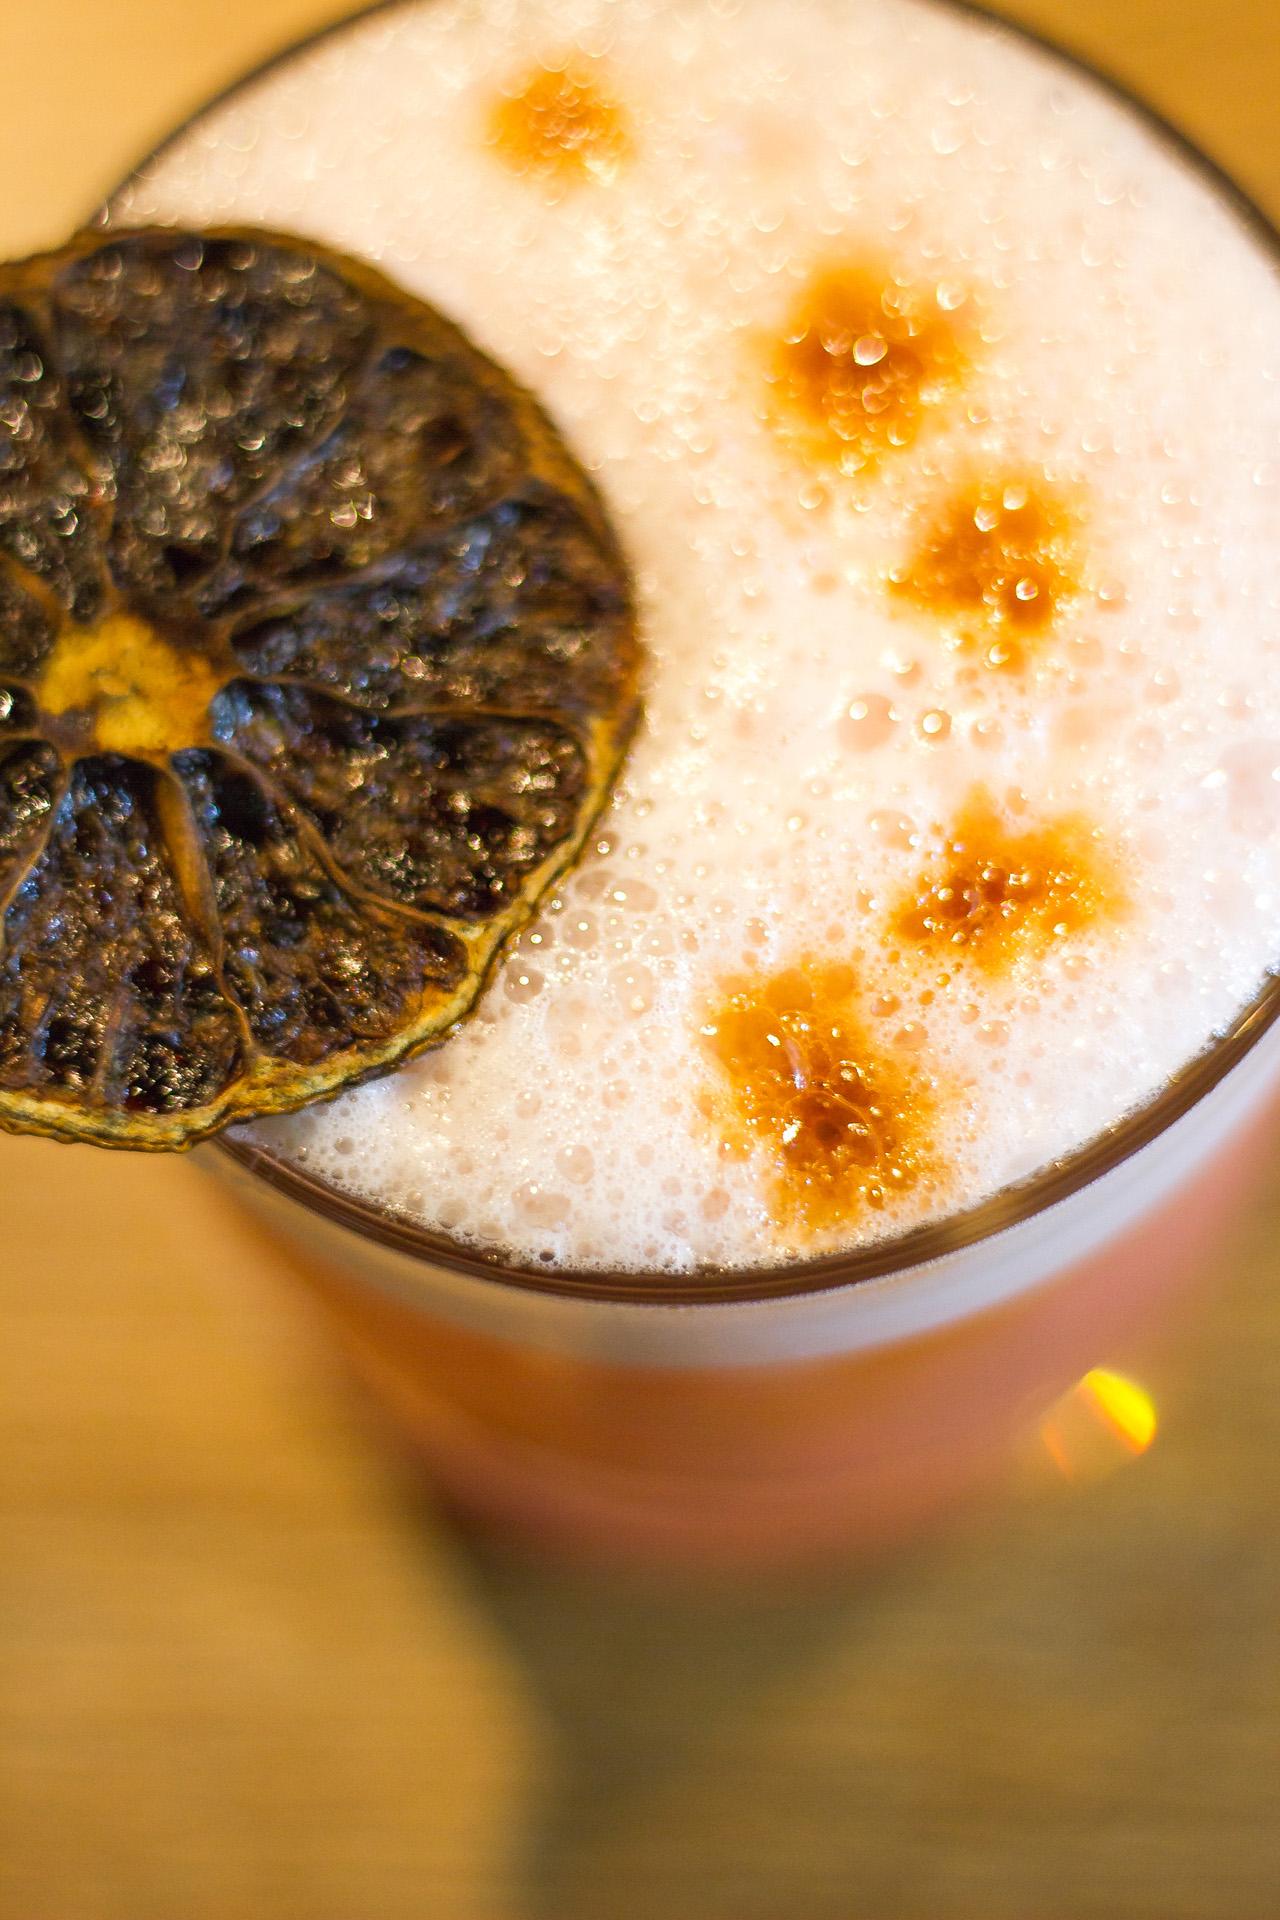 Drinks: Brasília Abaixo de Zer